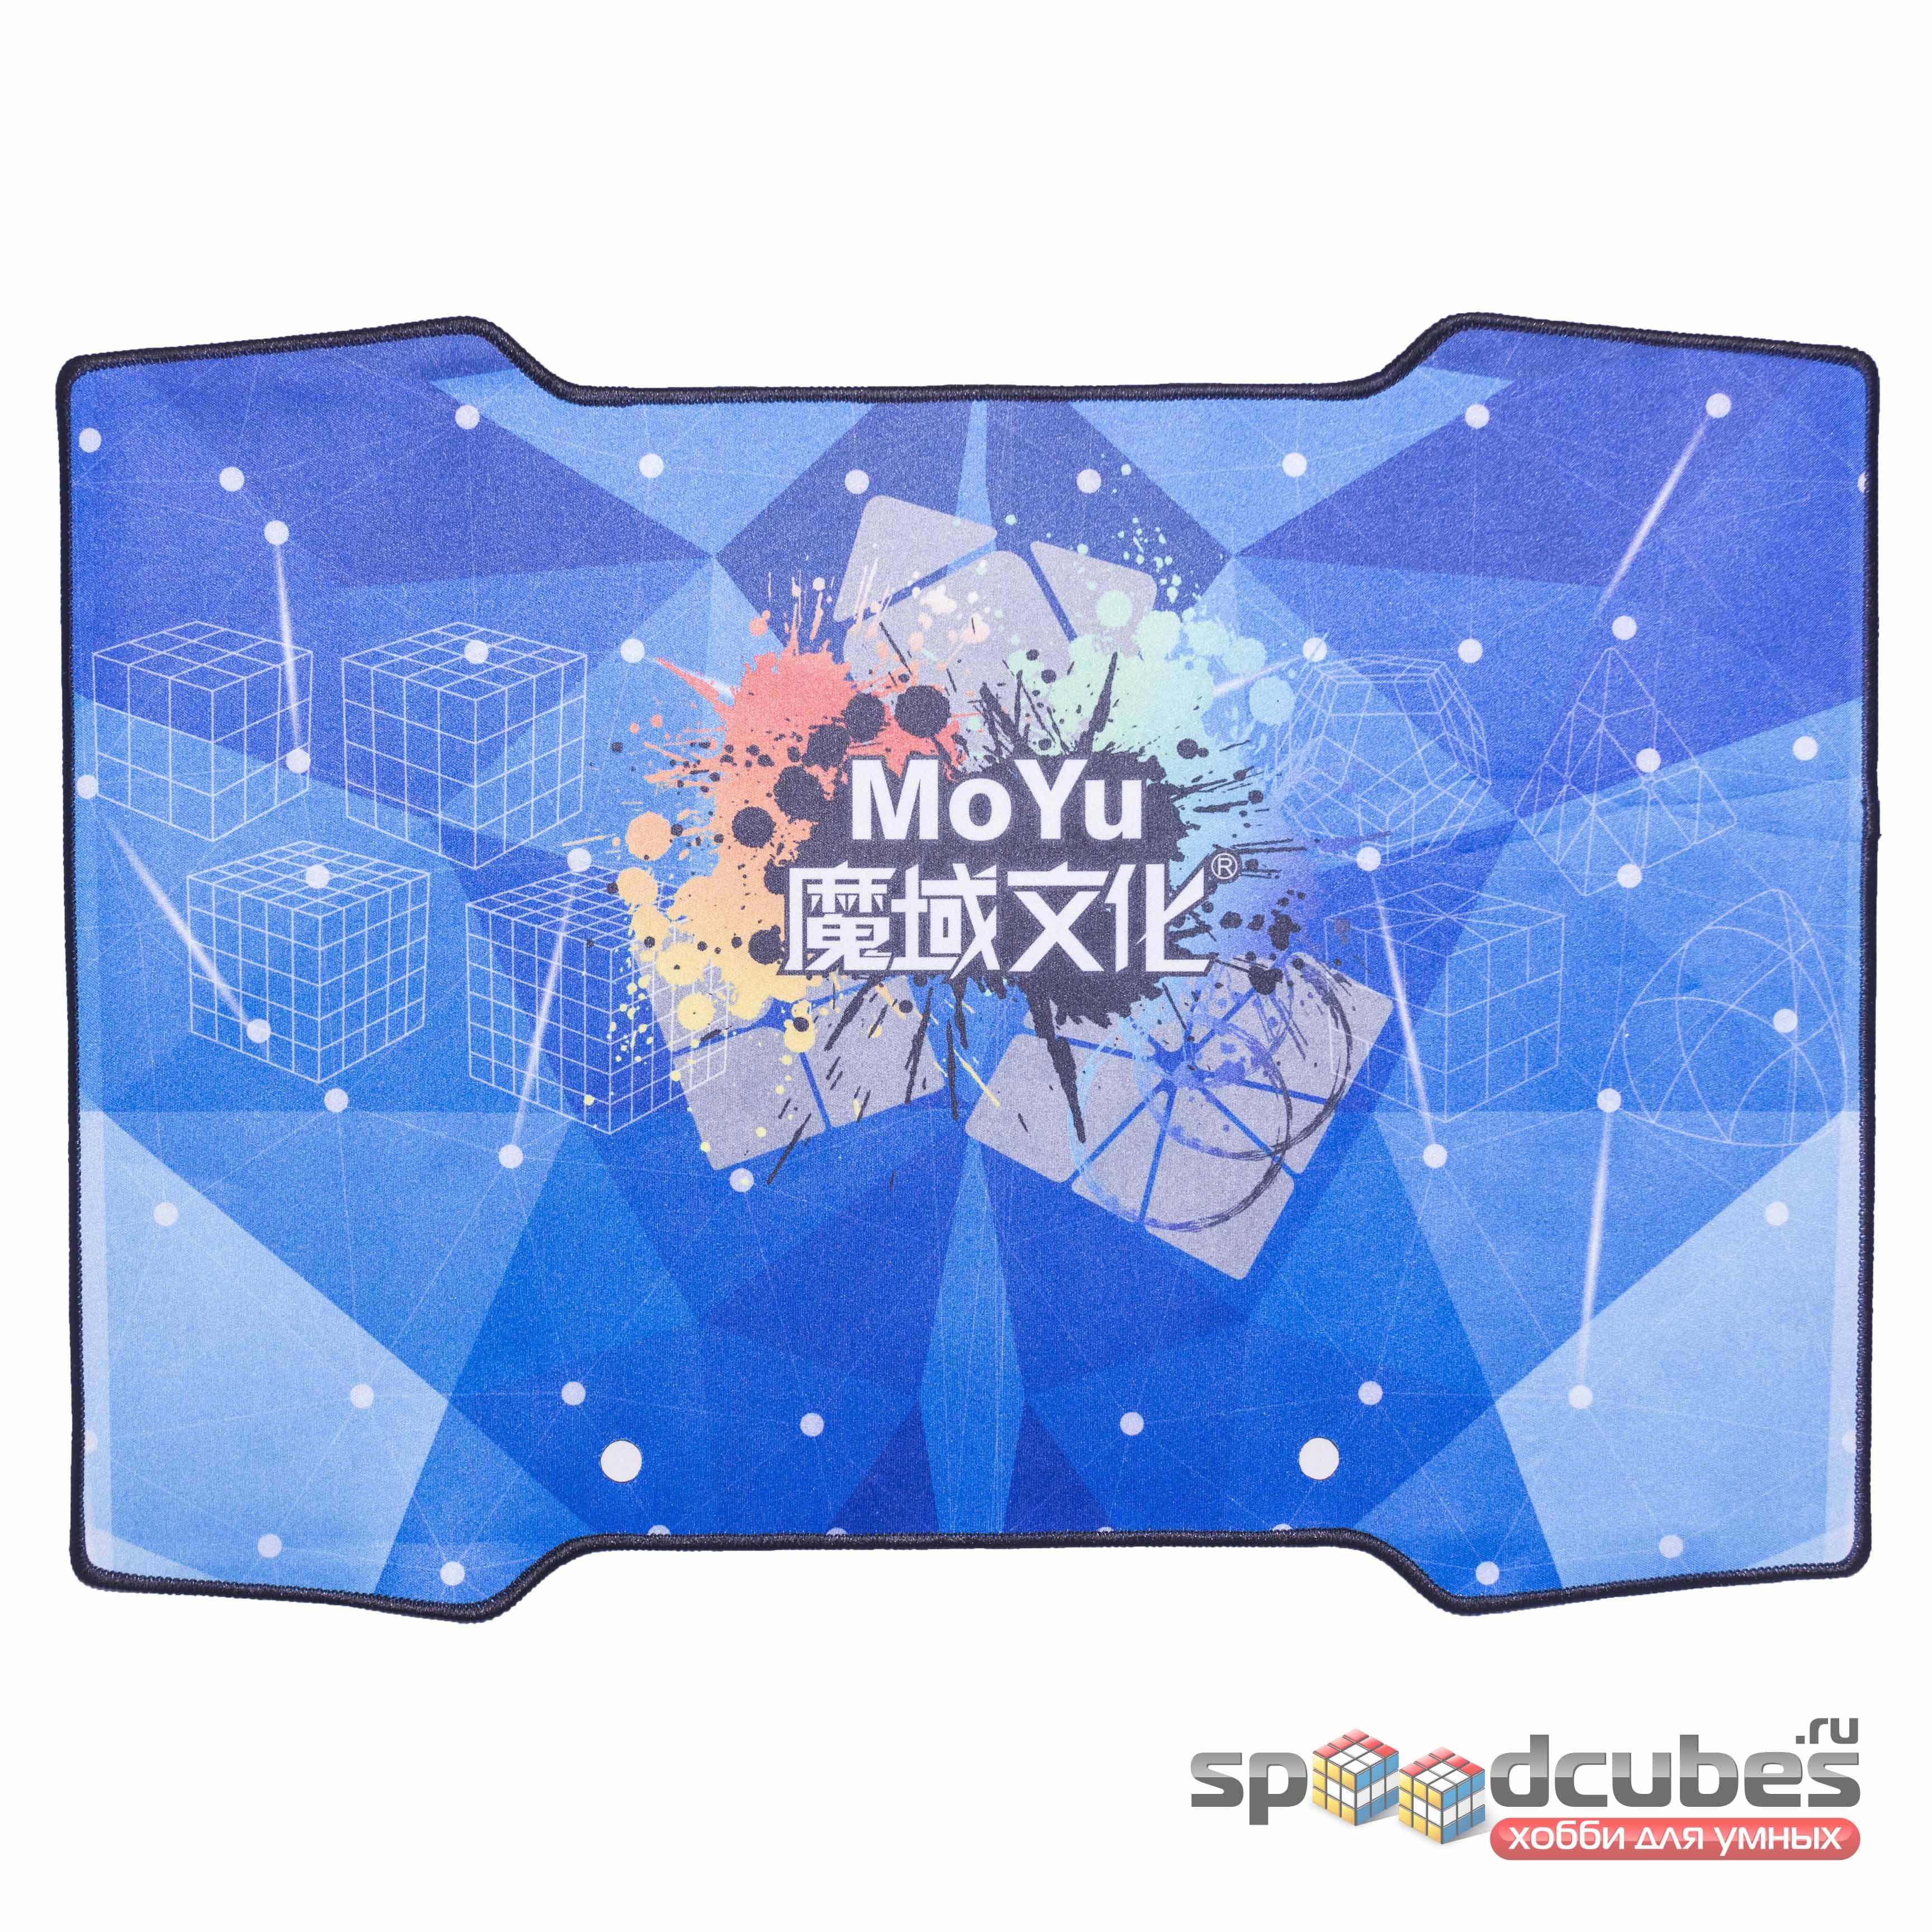 MoYu Cube Mat мат для спидкубинга 1